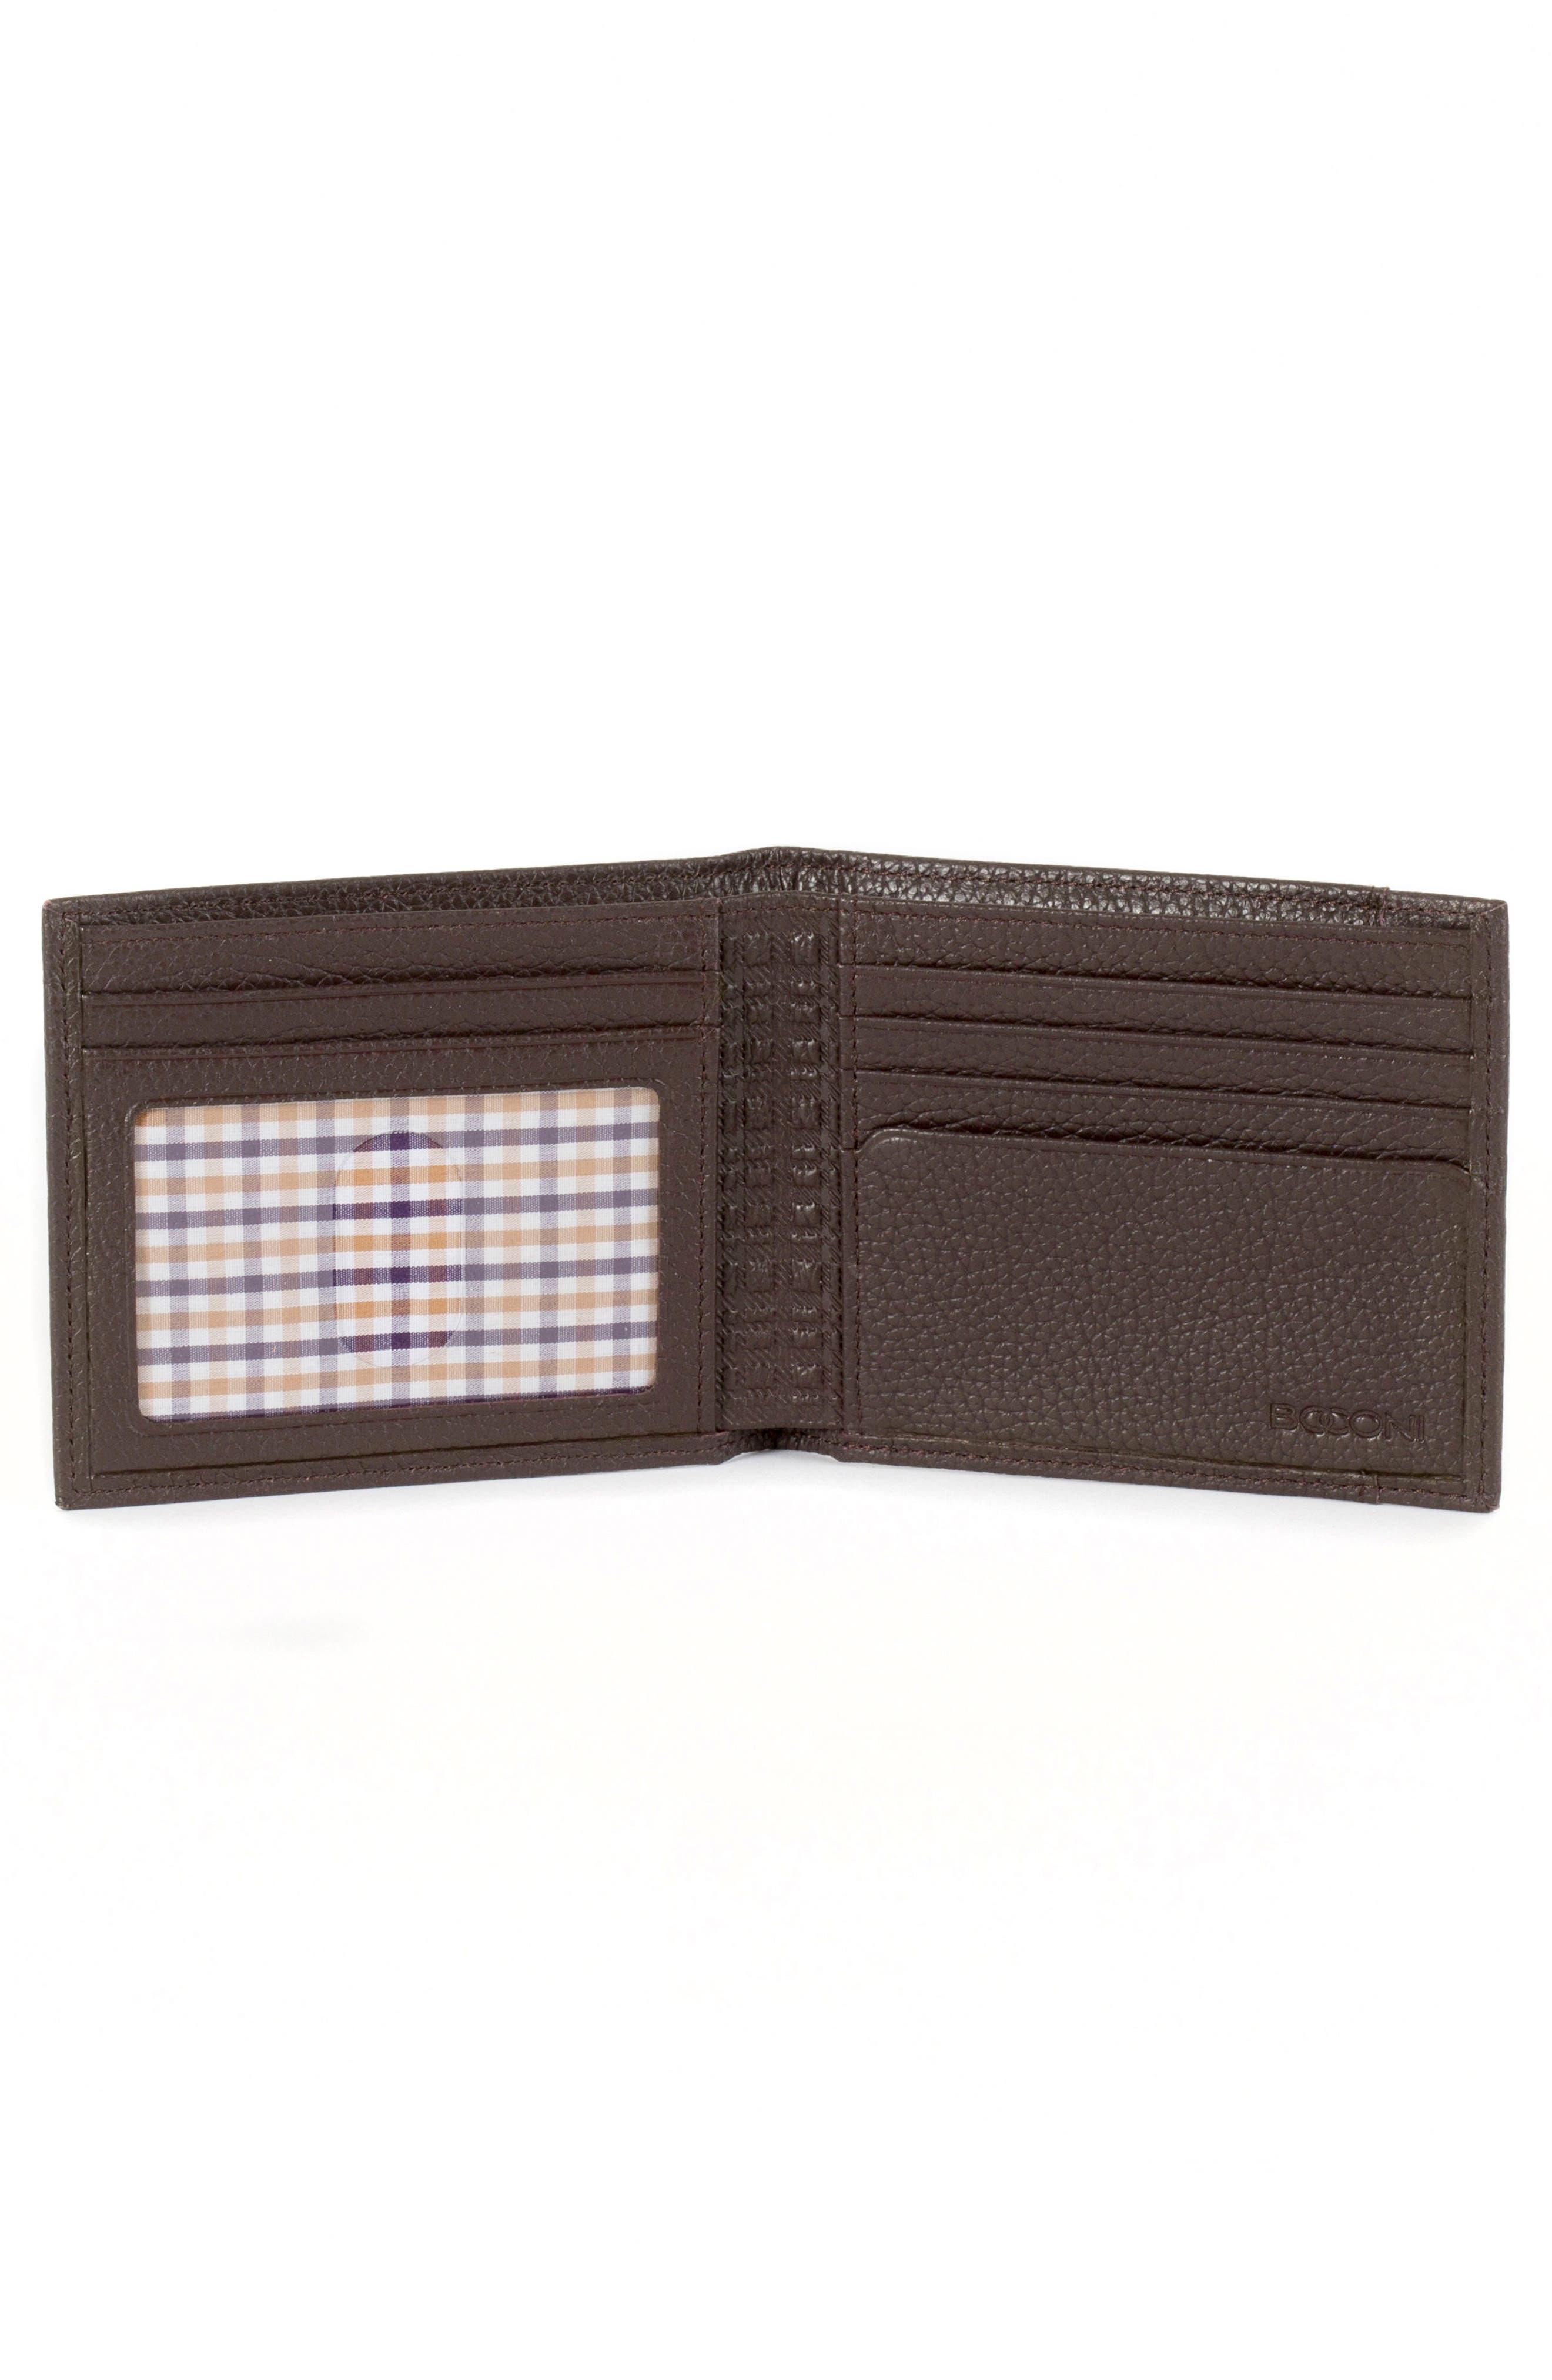 Garth Leather Bifold Wallet,                             Alternate thumbnail 2, color,                             Brown/ Tan/ Purple